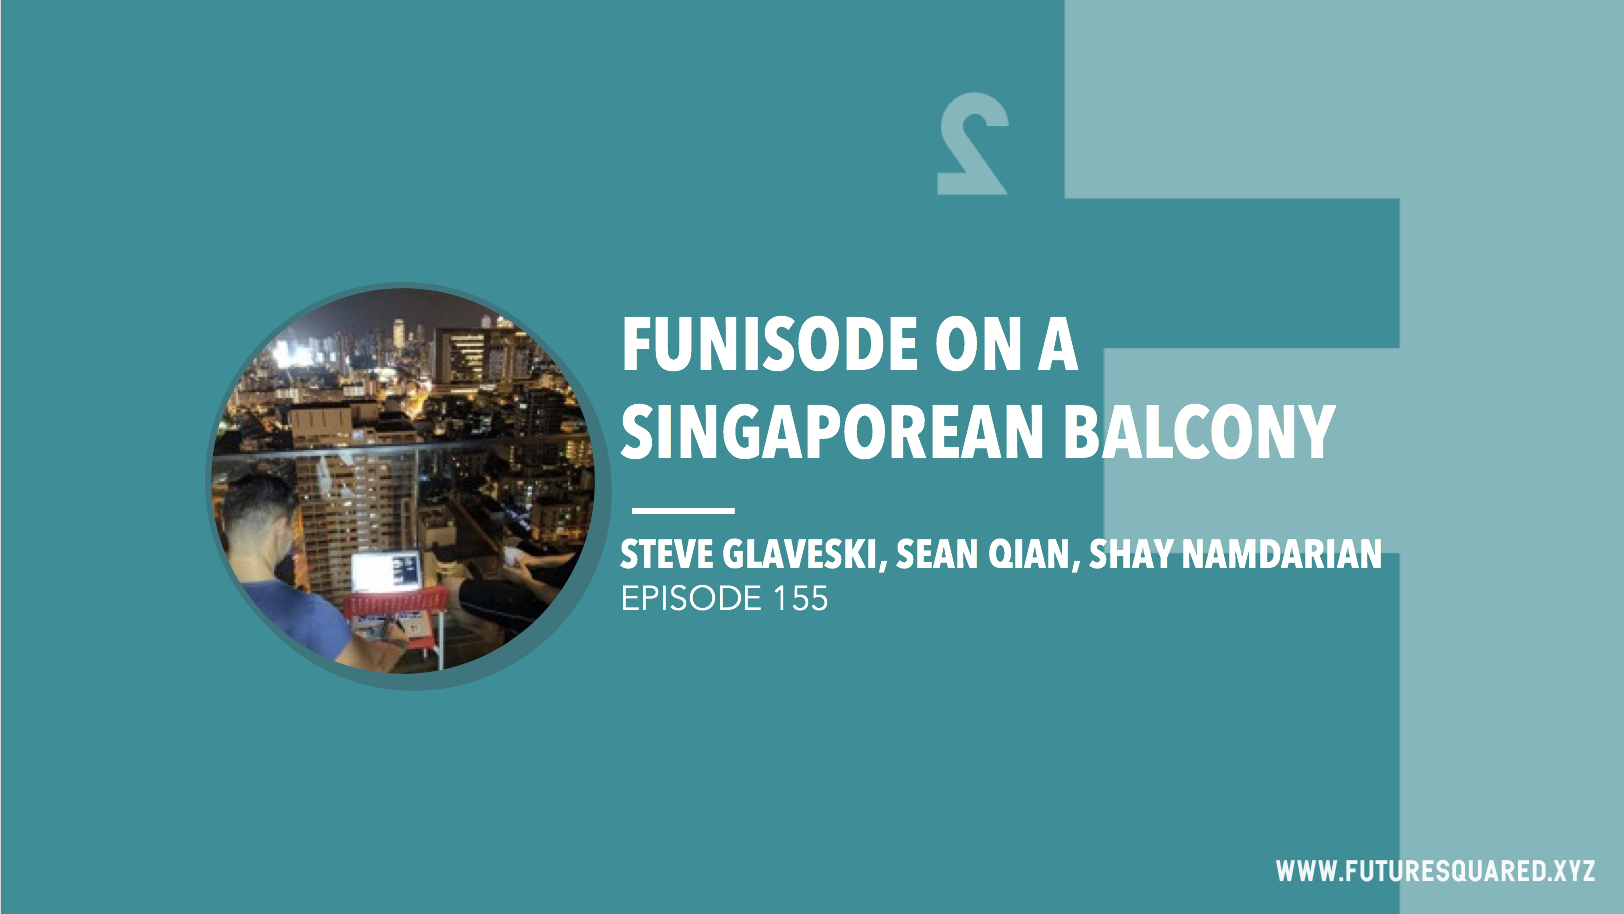 Future Squared Episode #155: Funisode on a Singaporean balcony